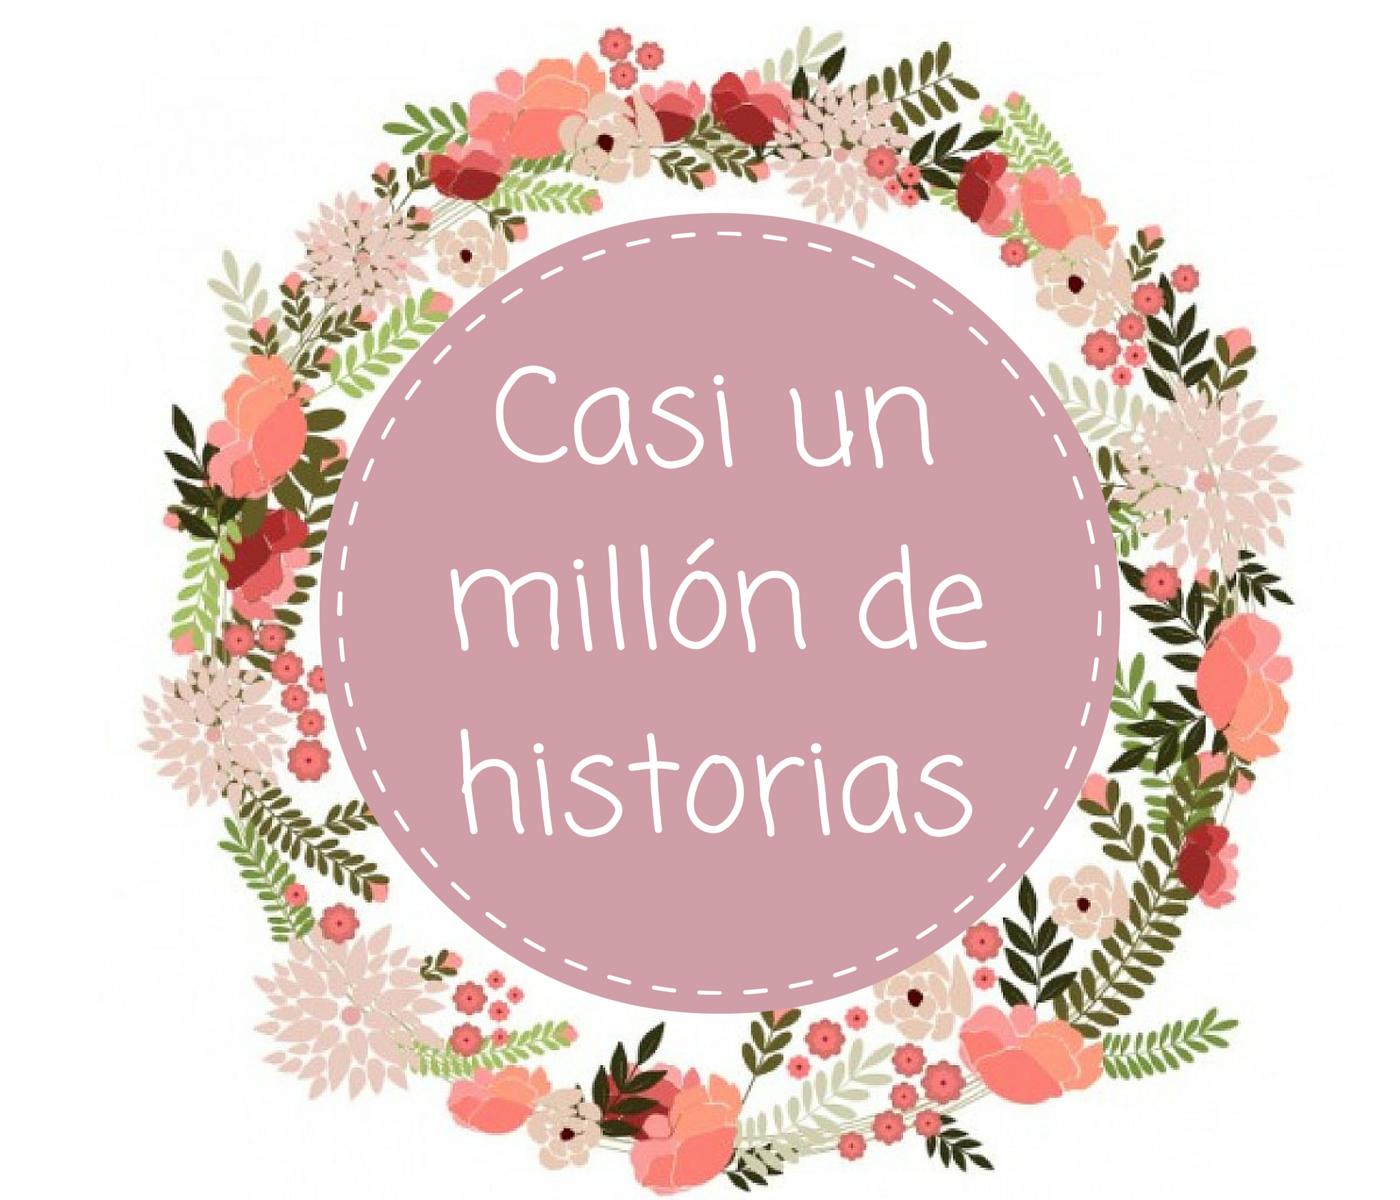 Casi un millón de historias